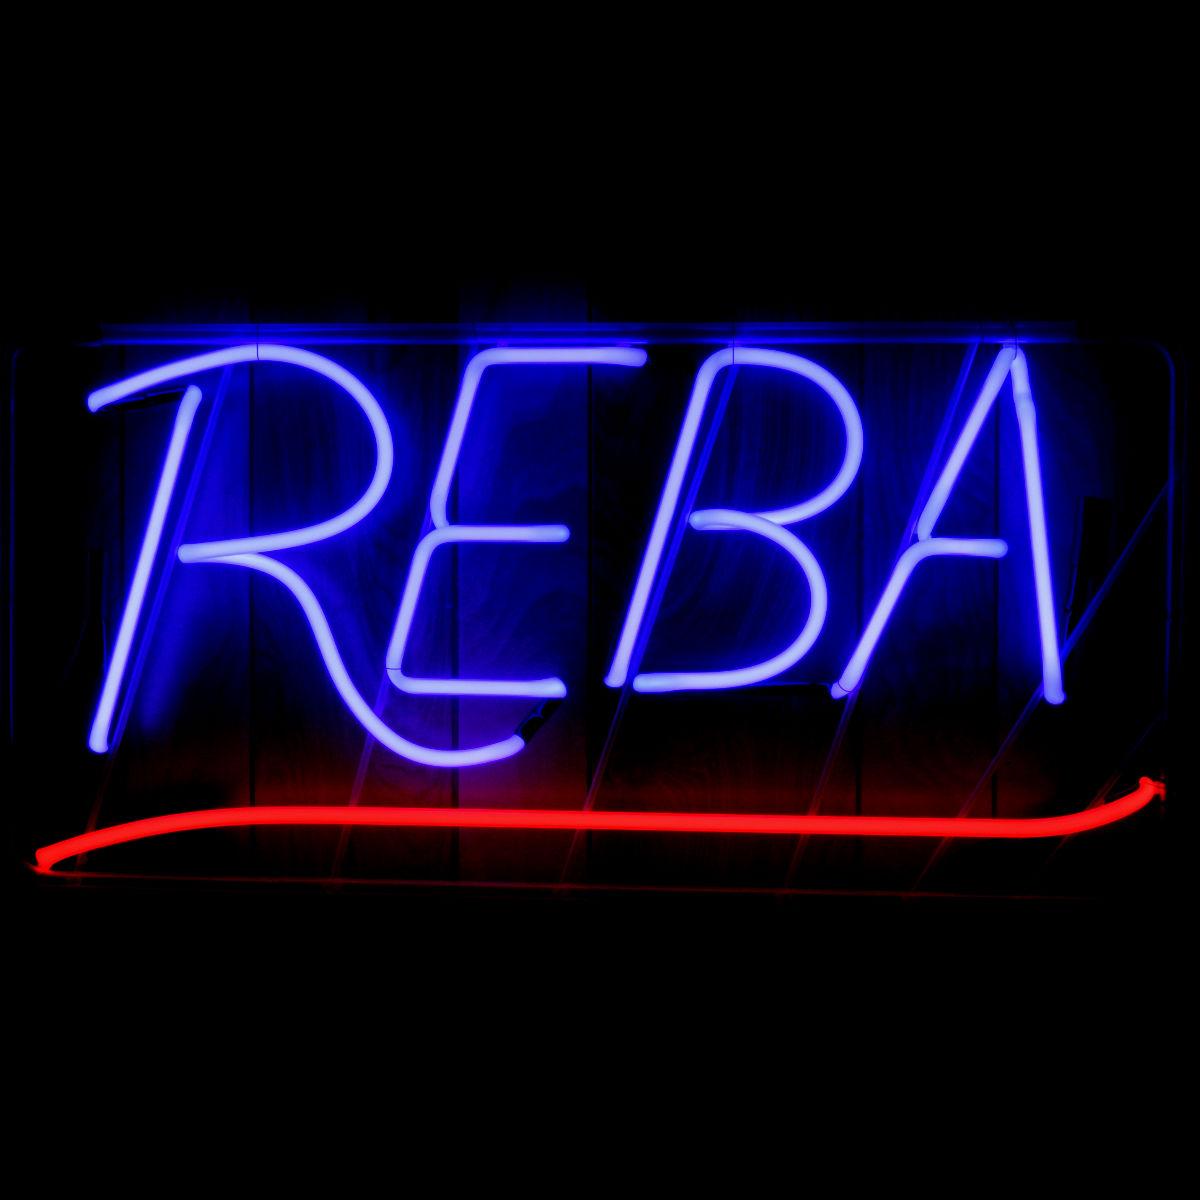 My name in custom neon! - by John Barton - Famous USA Neon Light Sculptor